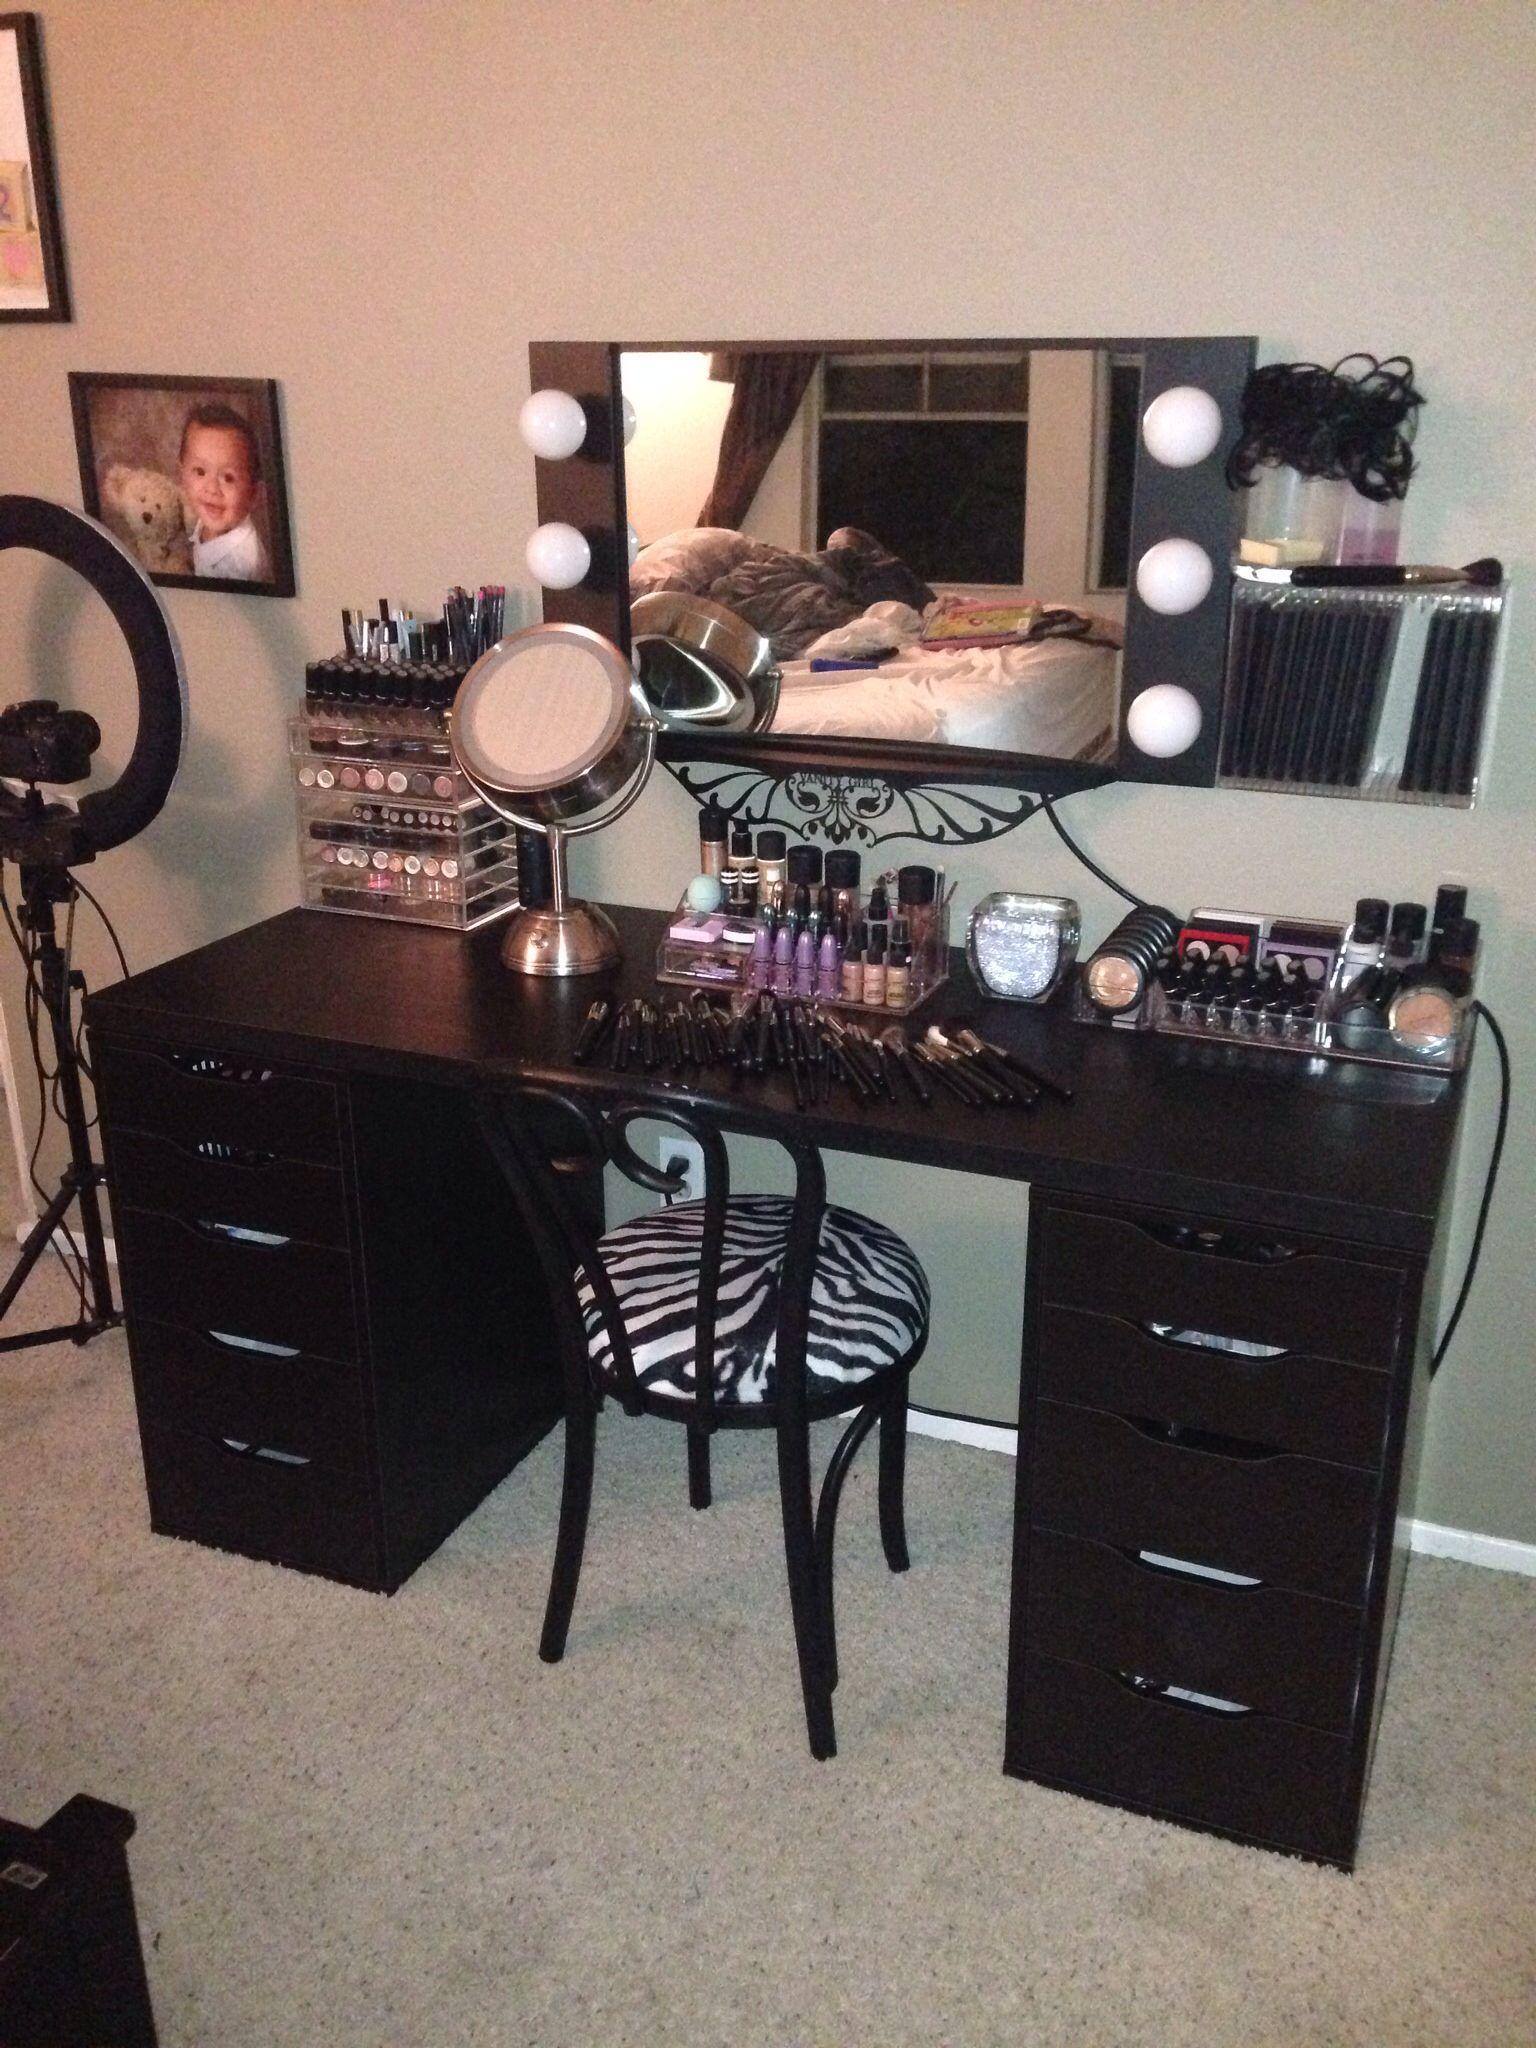 Makeup Vanity All Parts From Ikea Linnmon Table Top 59 Alex 5 Drawer Makeup Table Vanity Makeup Room Beauty Room